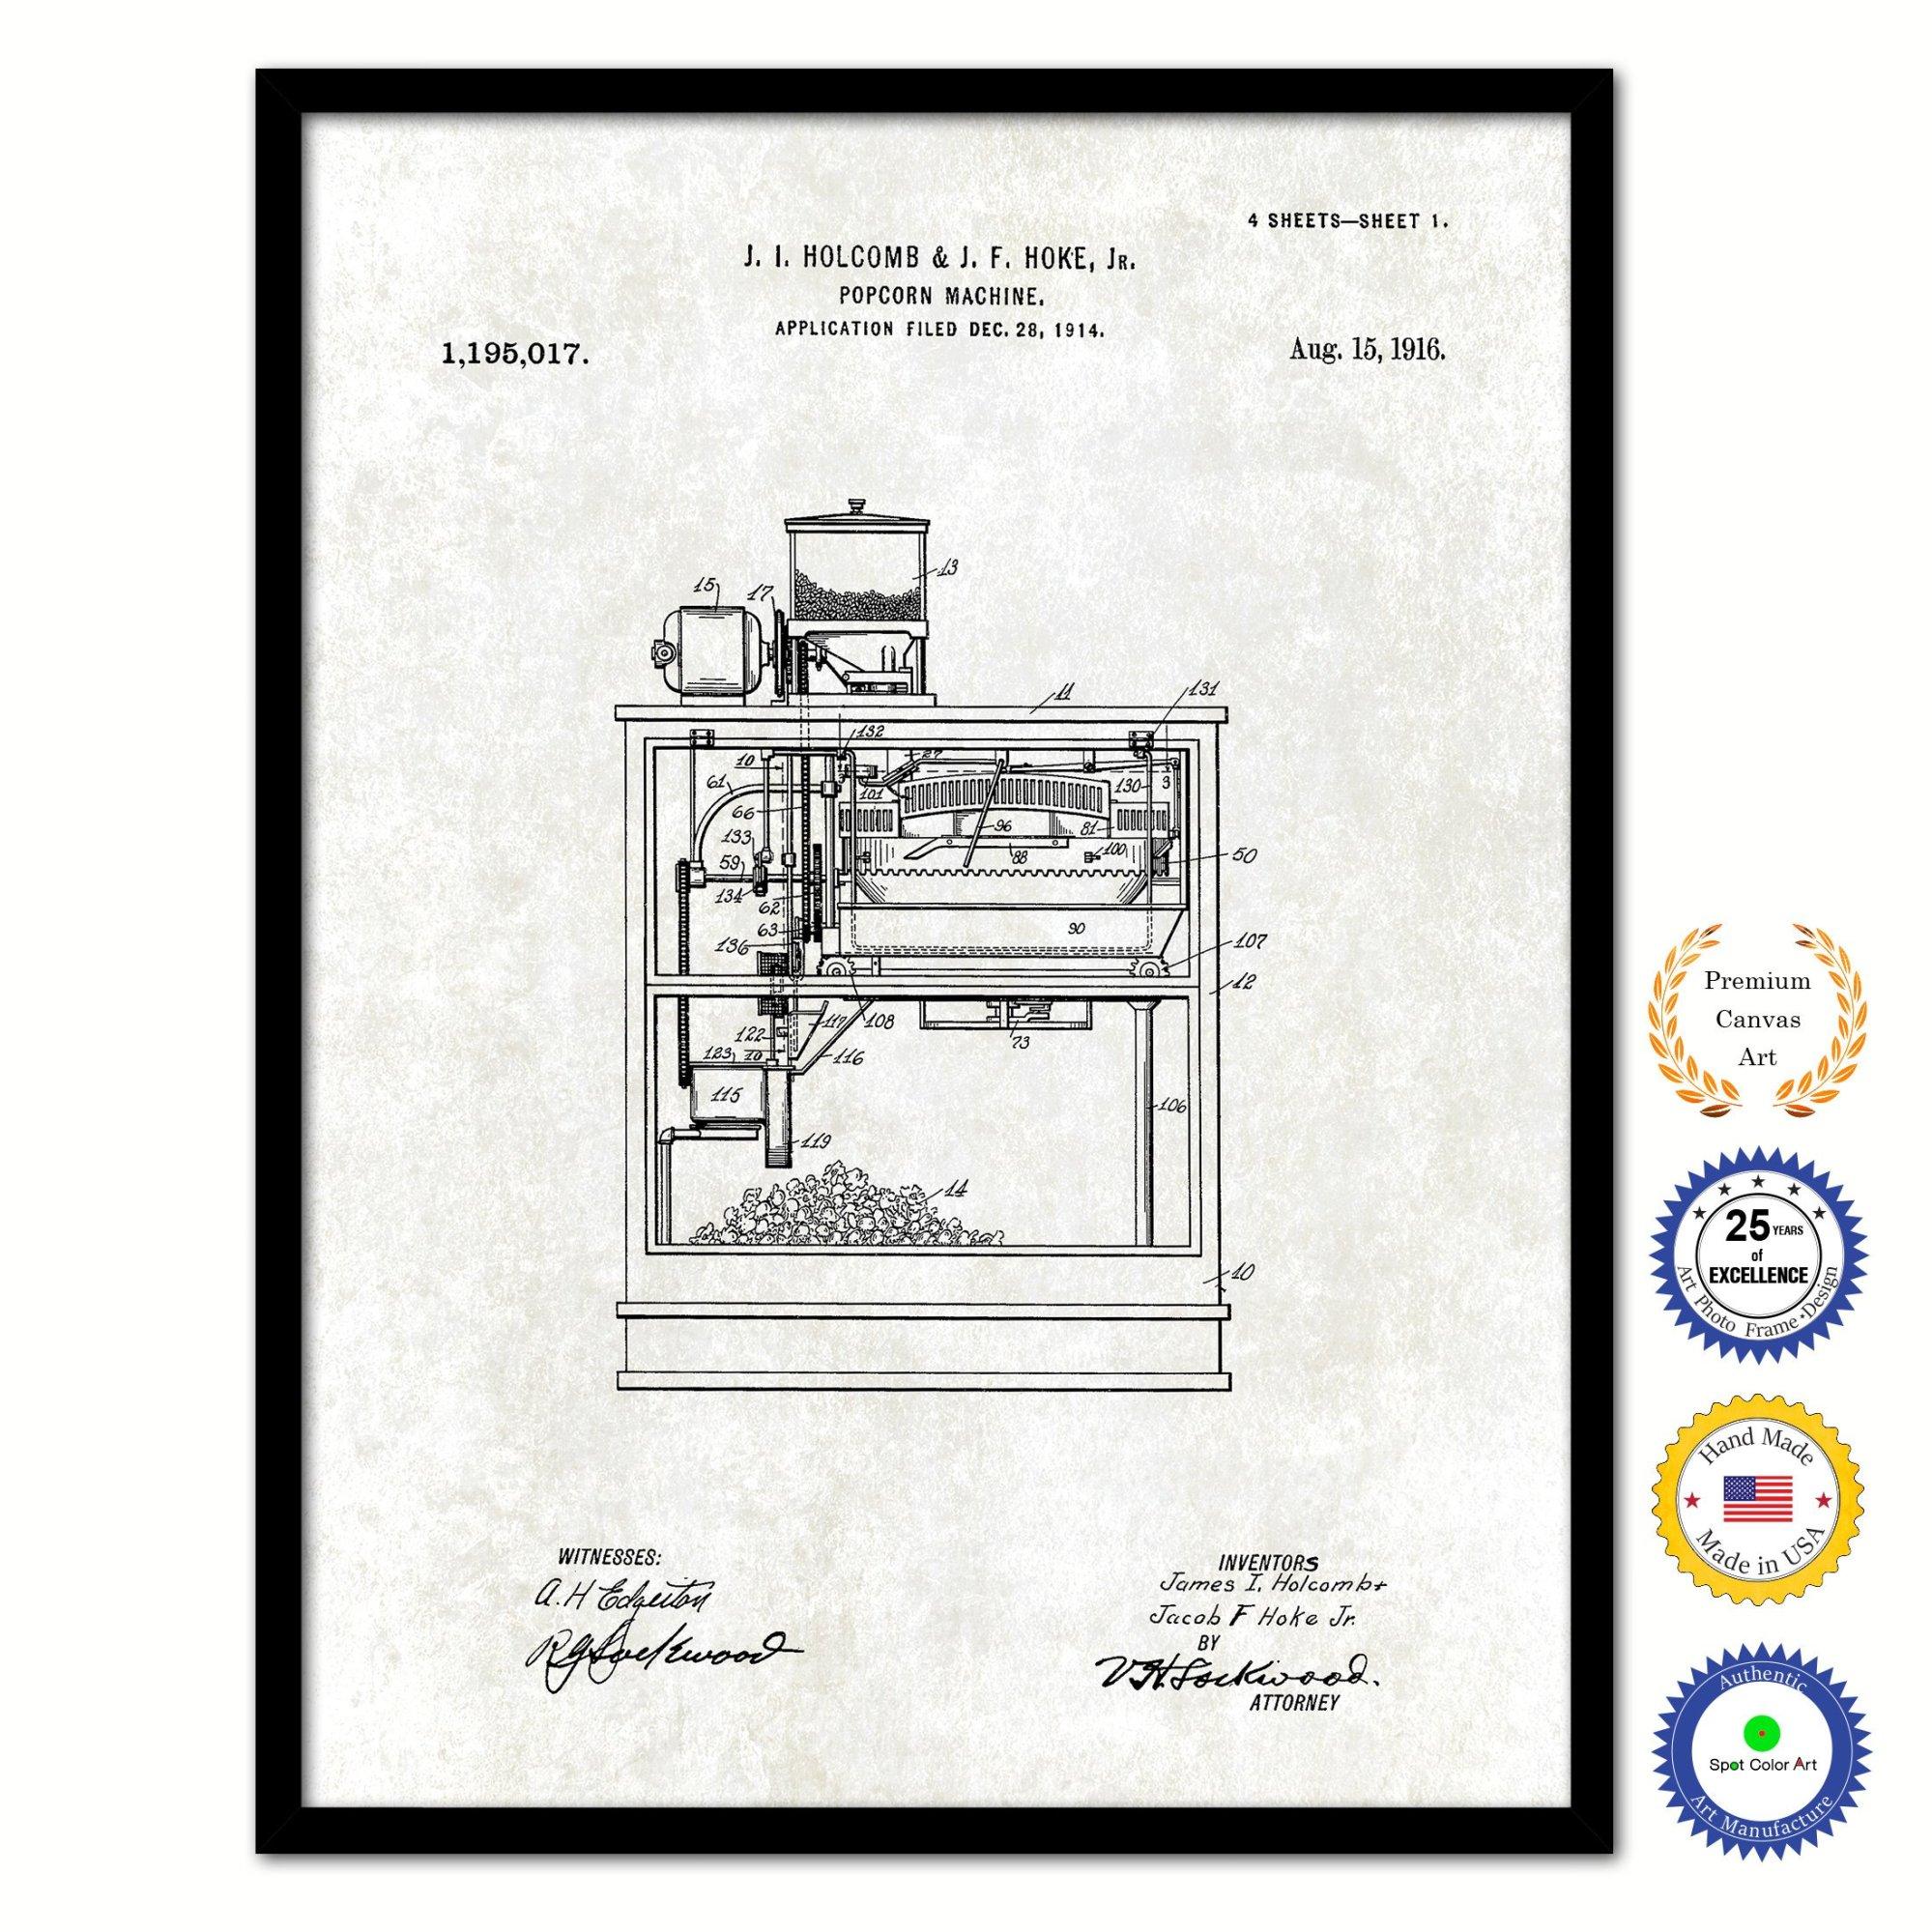 hight resolution of 2200x2200 popcorn machine vintage patent artwork black framed canvas popcorn machine drawing